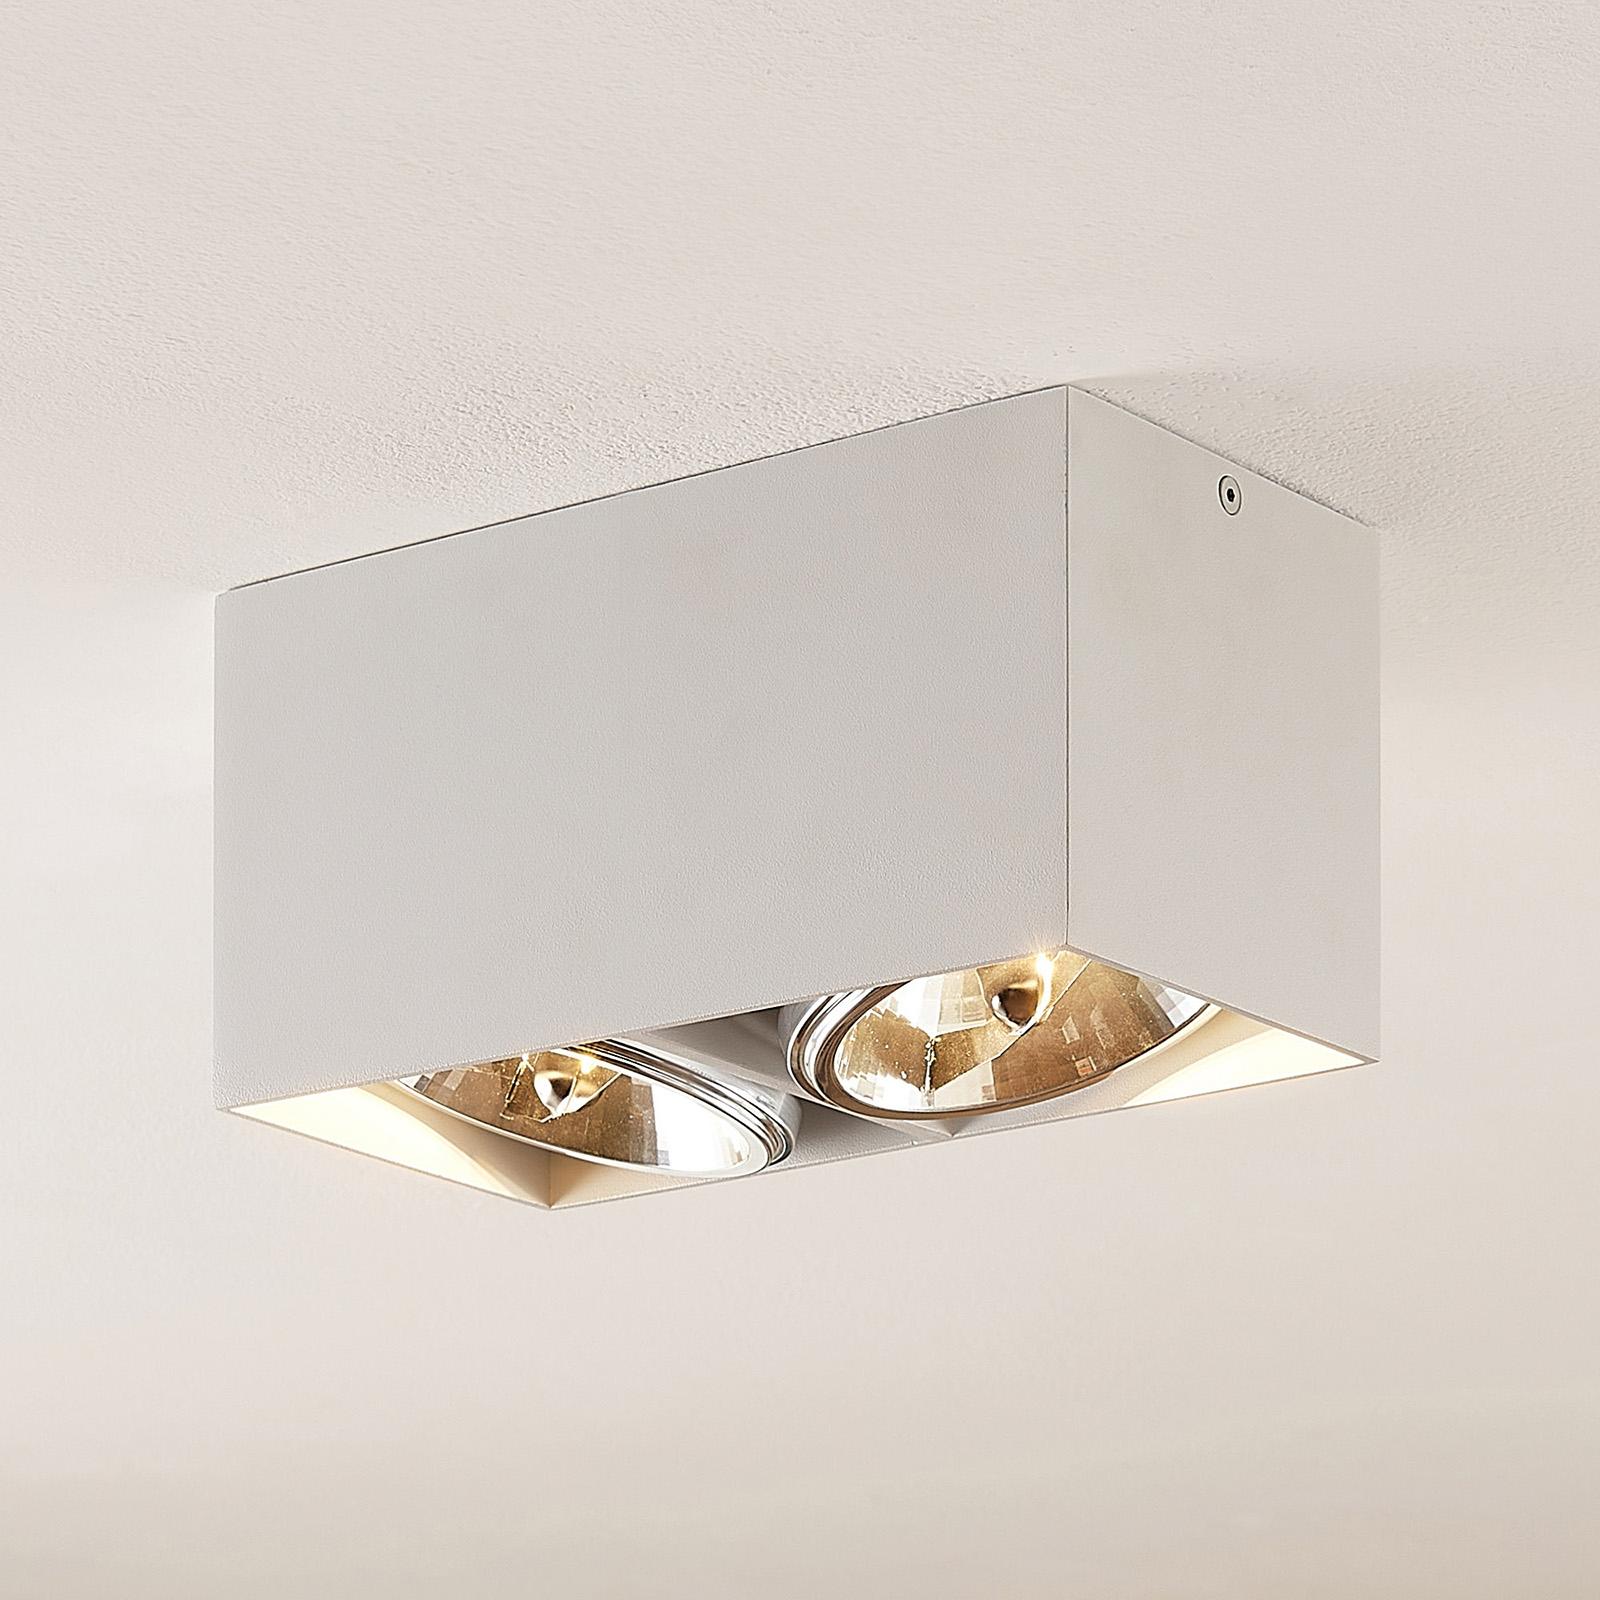 Arcchio Jarle taklampe, 2 lyskilder hvit